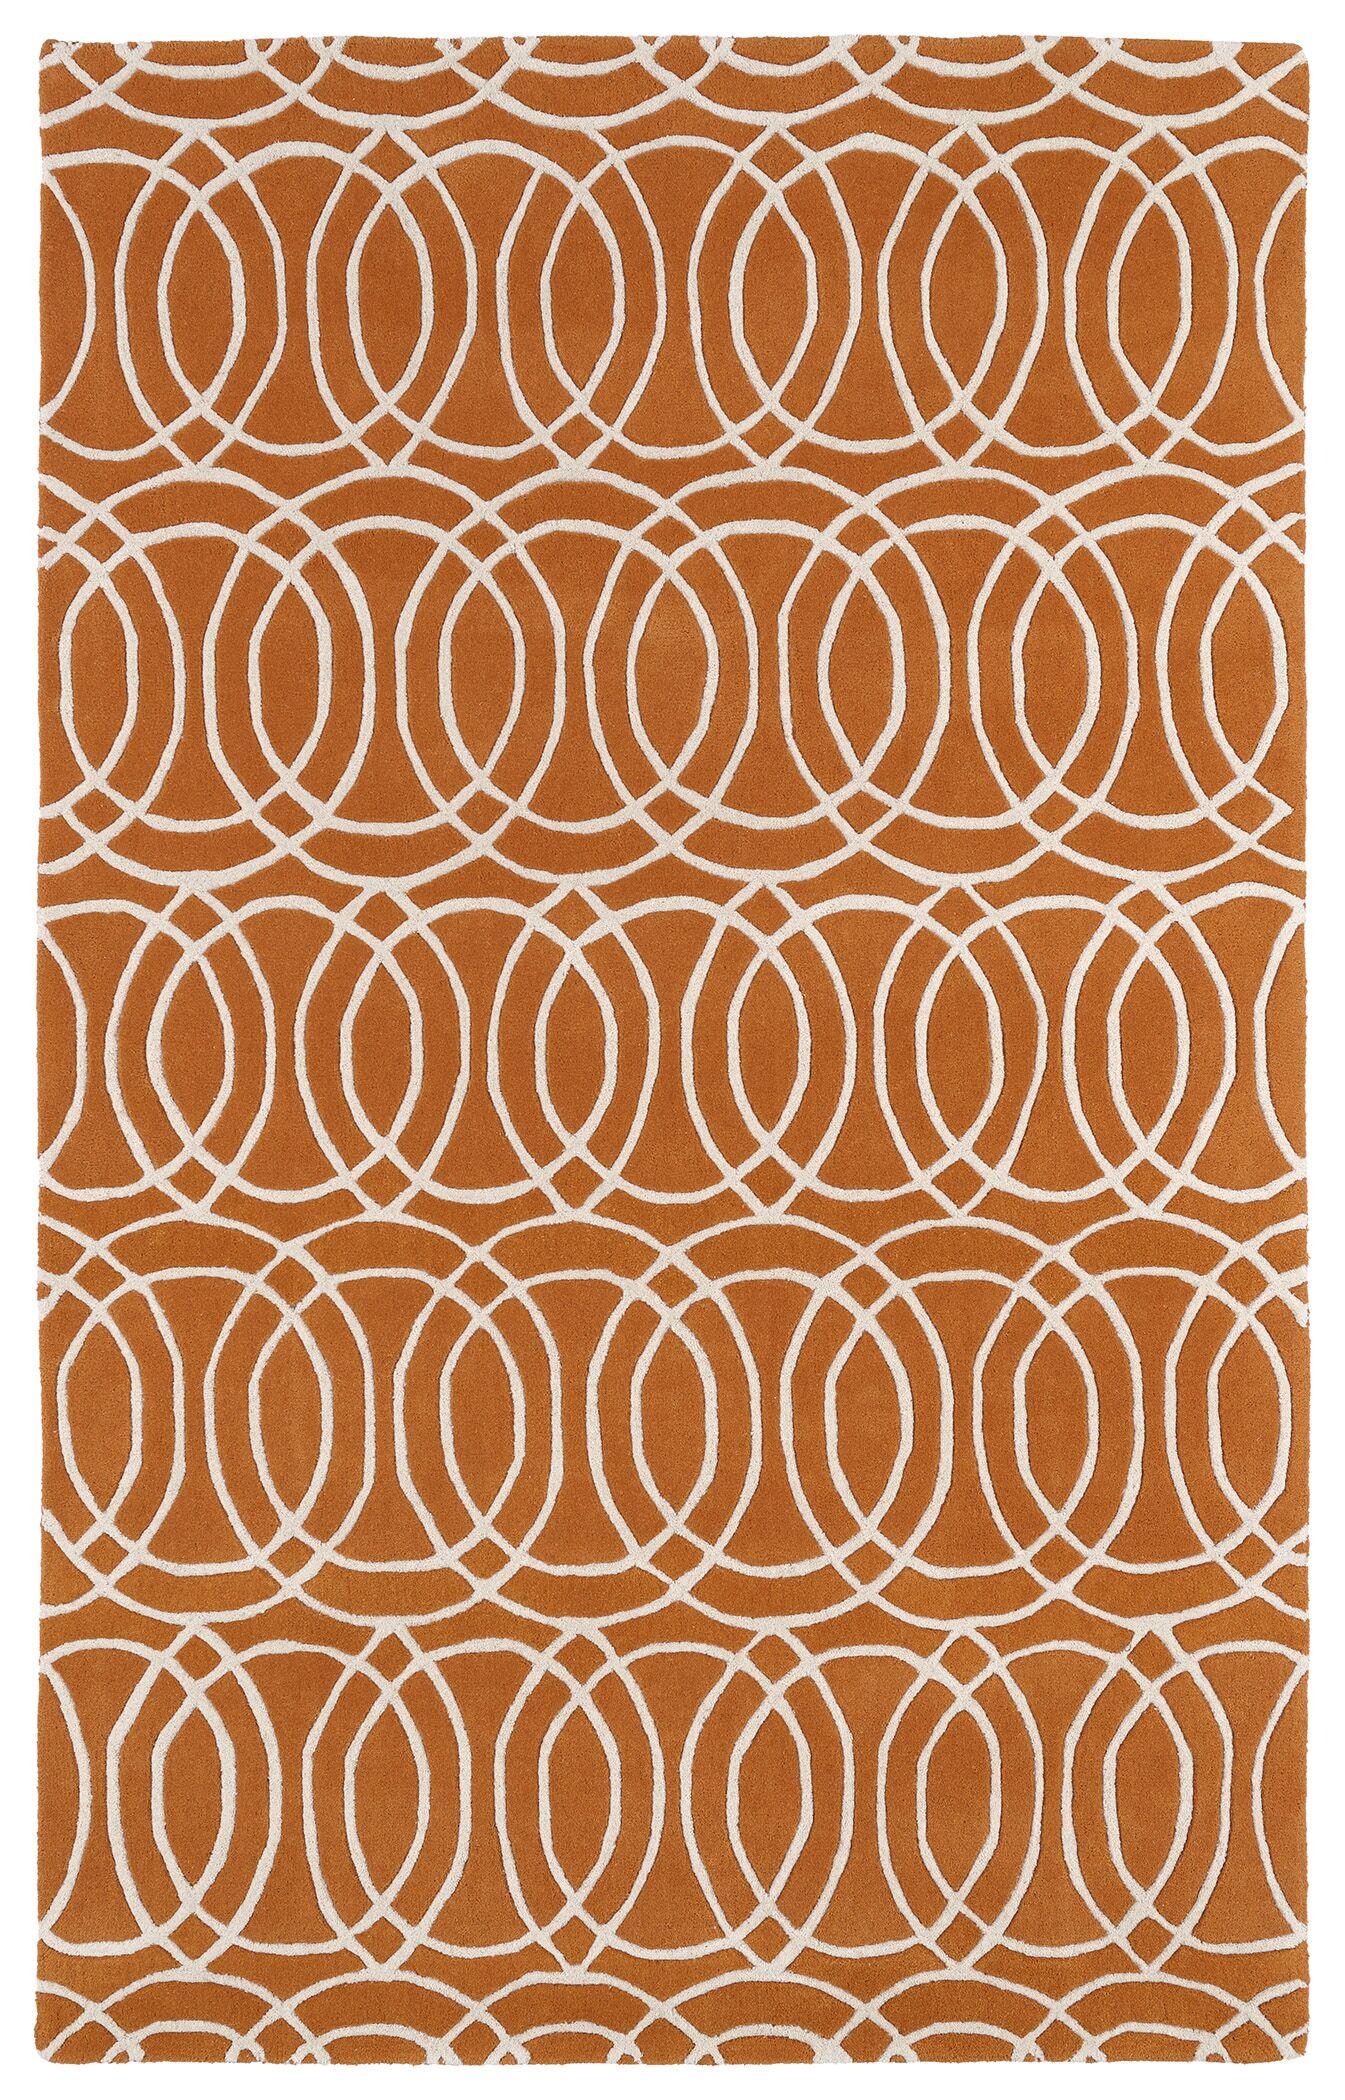 Molly Orange/White Area Rug Rug Size: Rectangle 3' x 5'